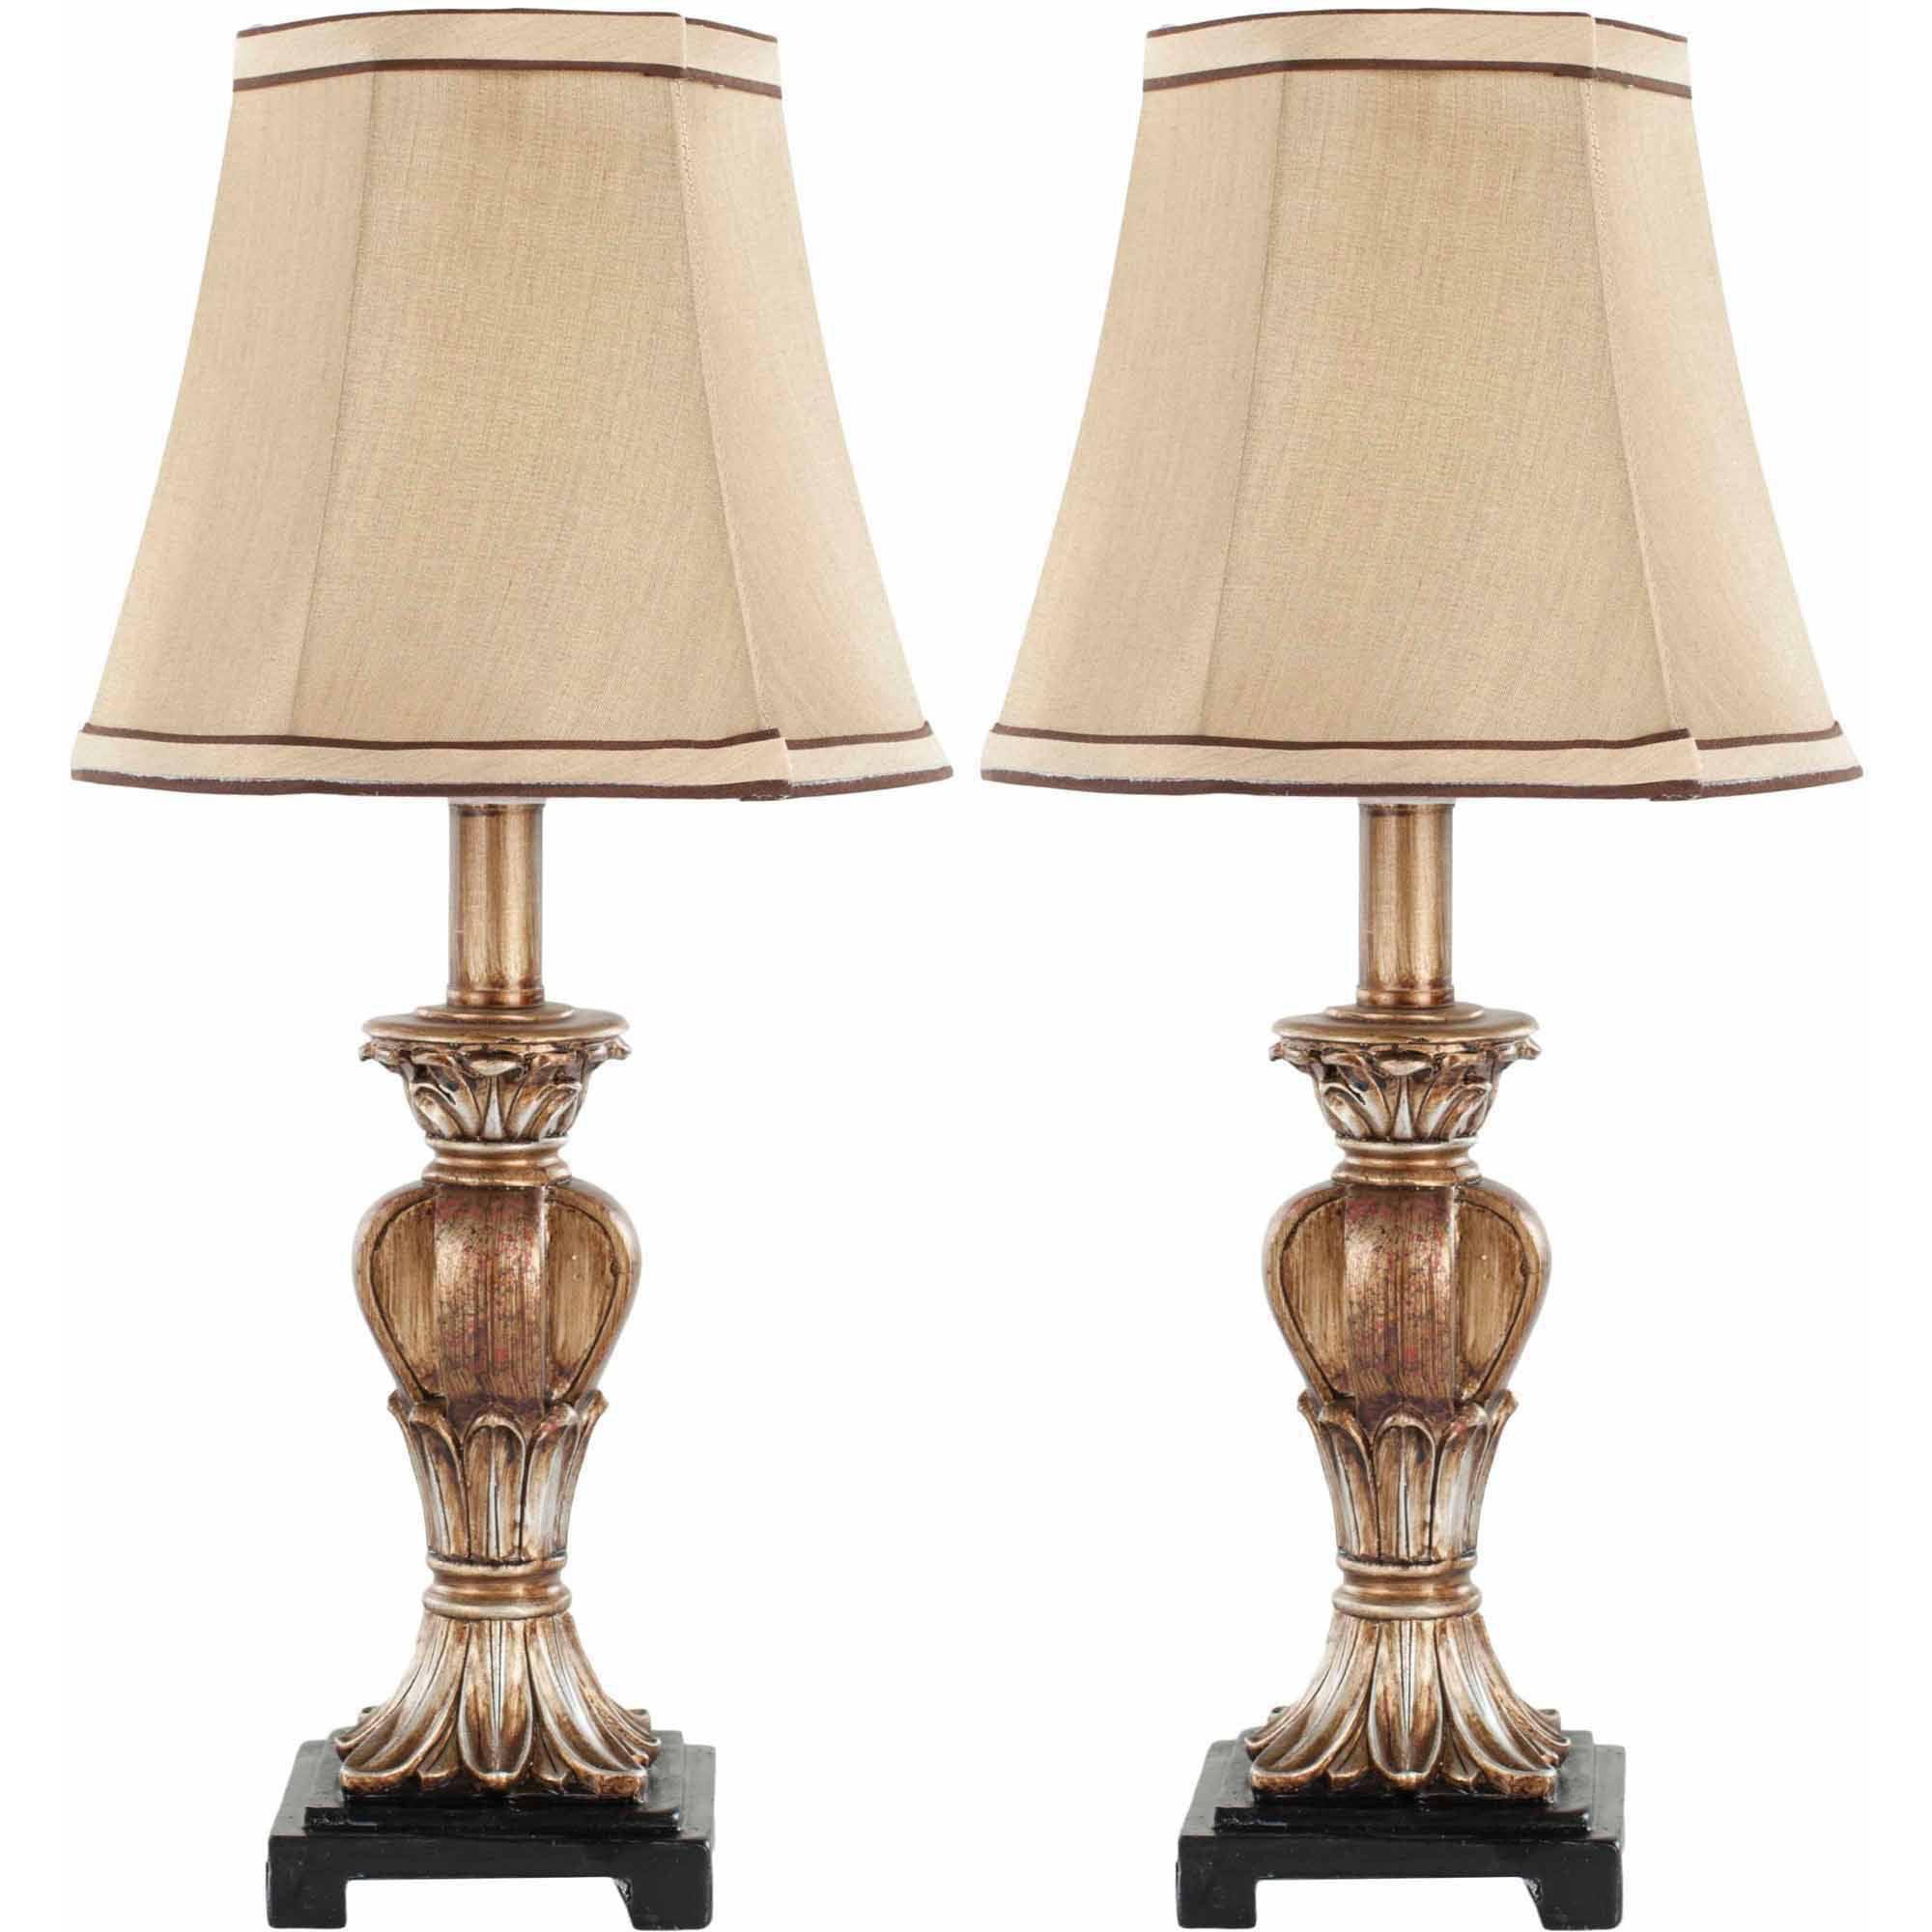 Safavieh Gabriella Mini Urn Lamp, Set of 2 by Safavieh